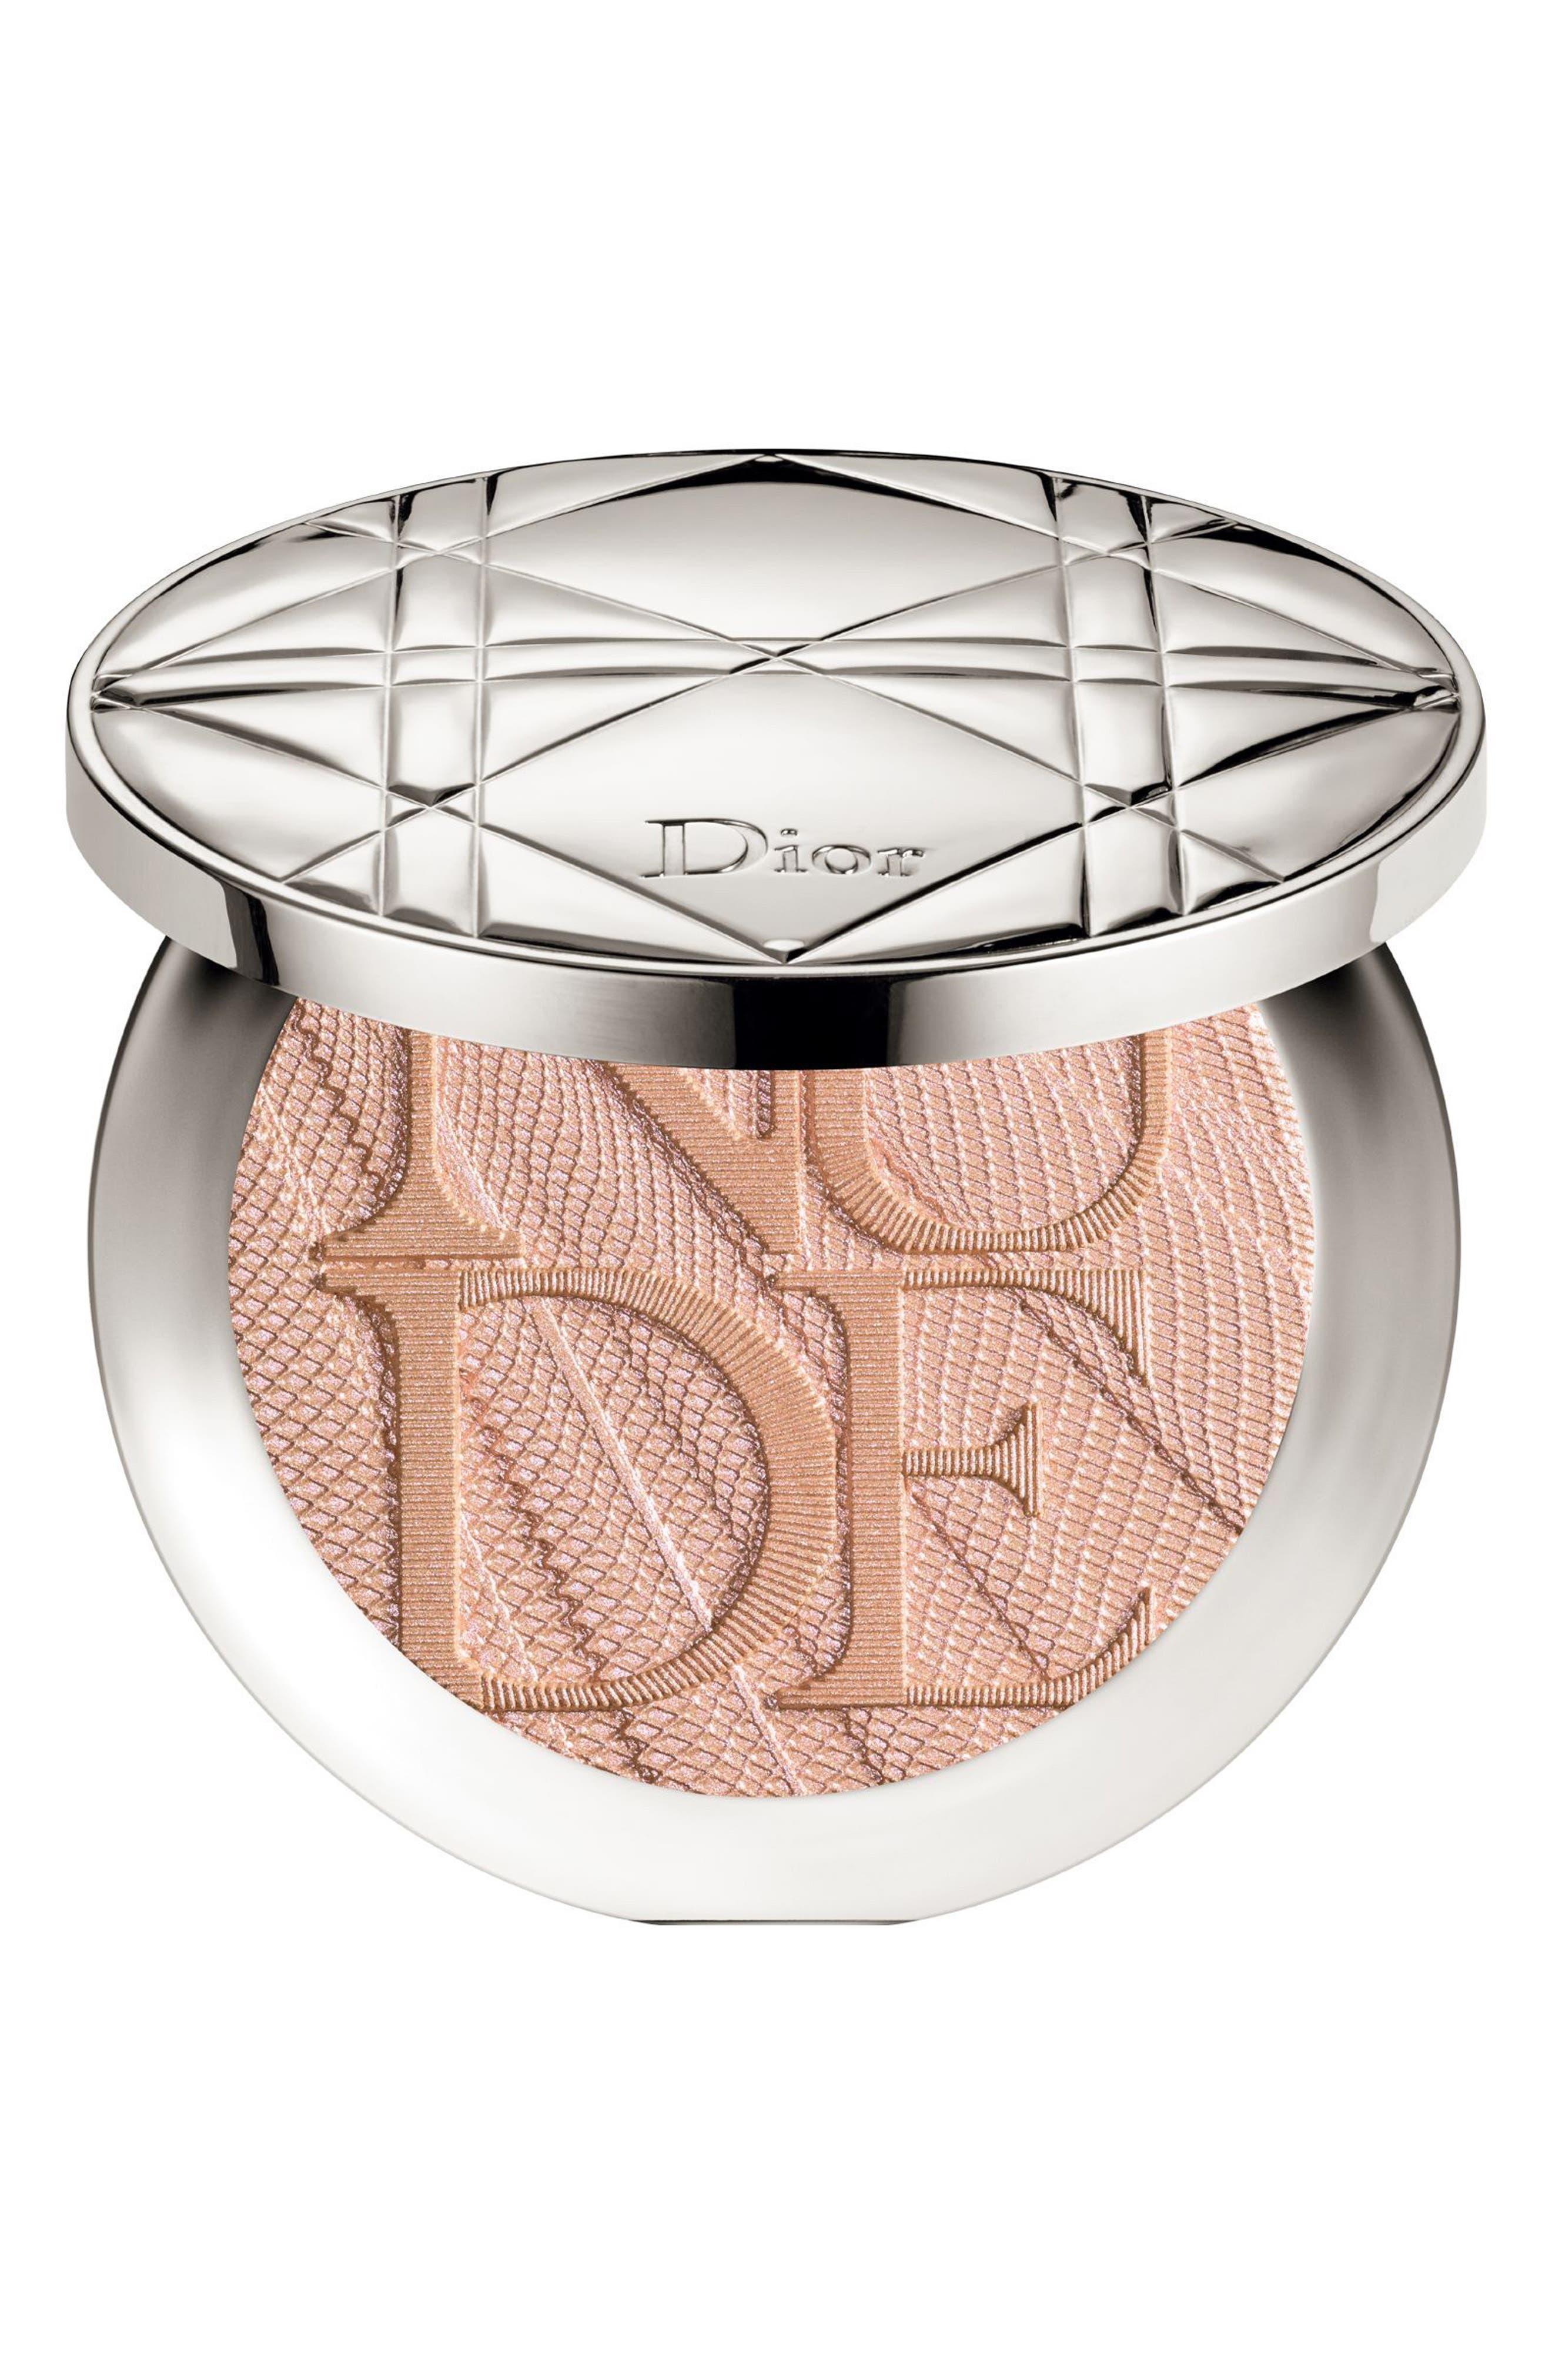 Main Image - Dior Diorskin Nude Air Luminizer Glow Addict Holographic Sculpting Powder